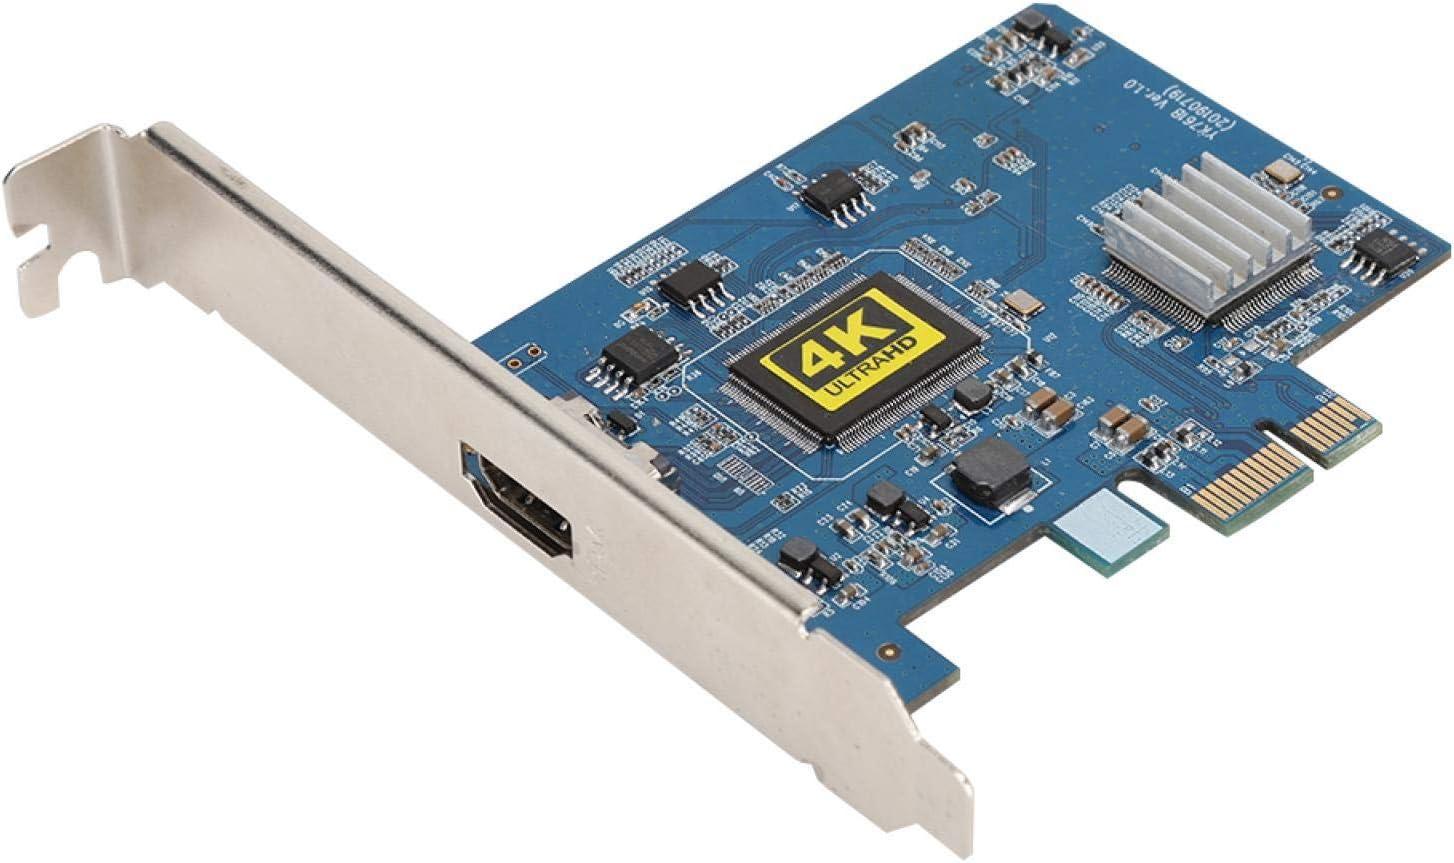 Goshyda PCI New product type SALENEW very popular! E to HDMI High Card Capture PVC Broad